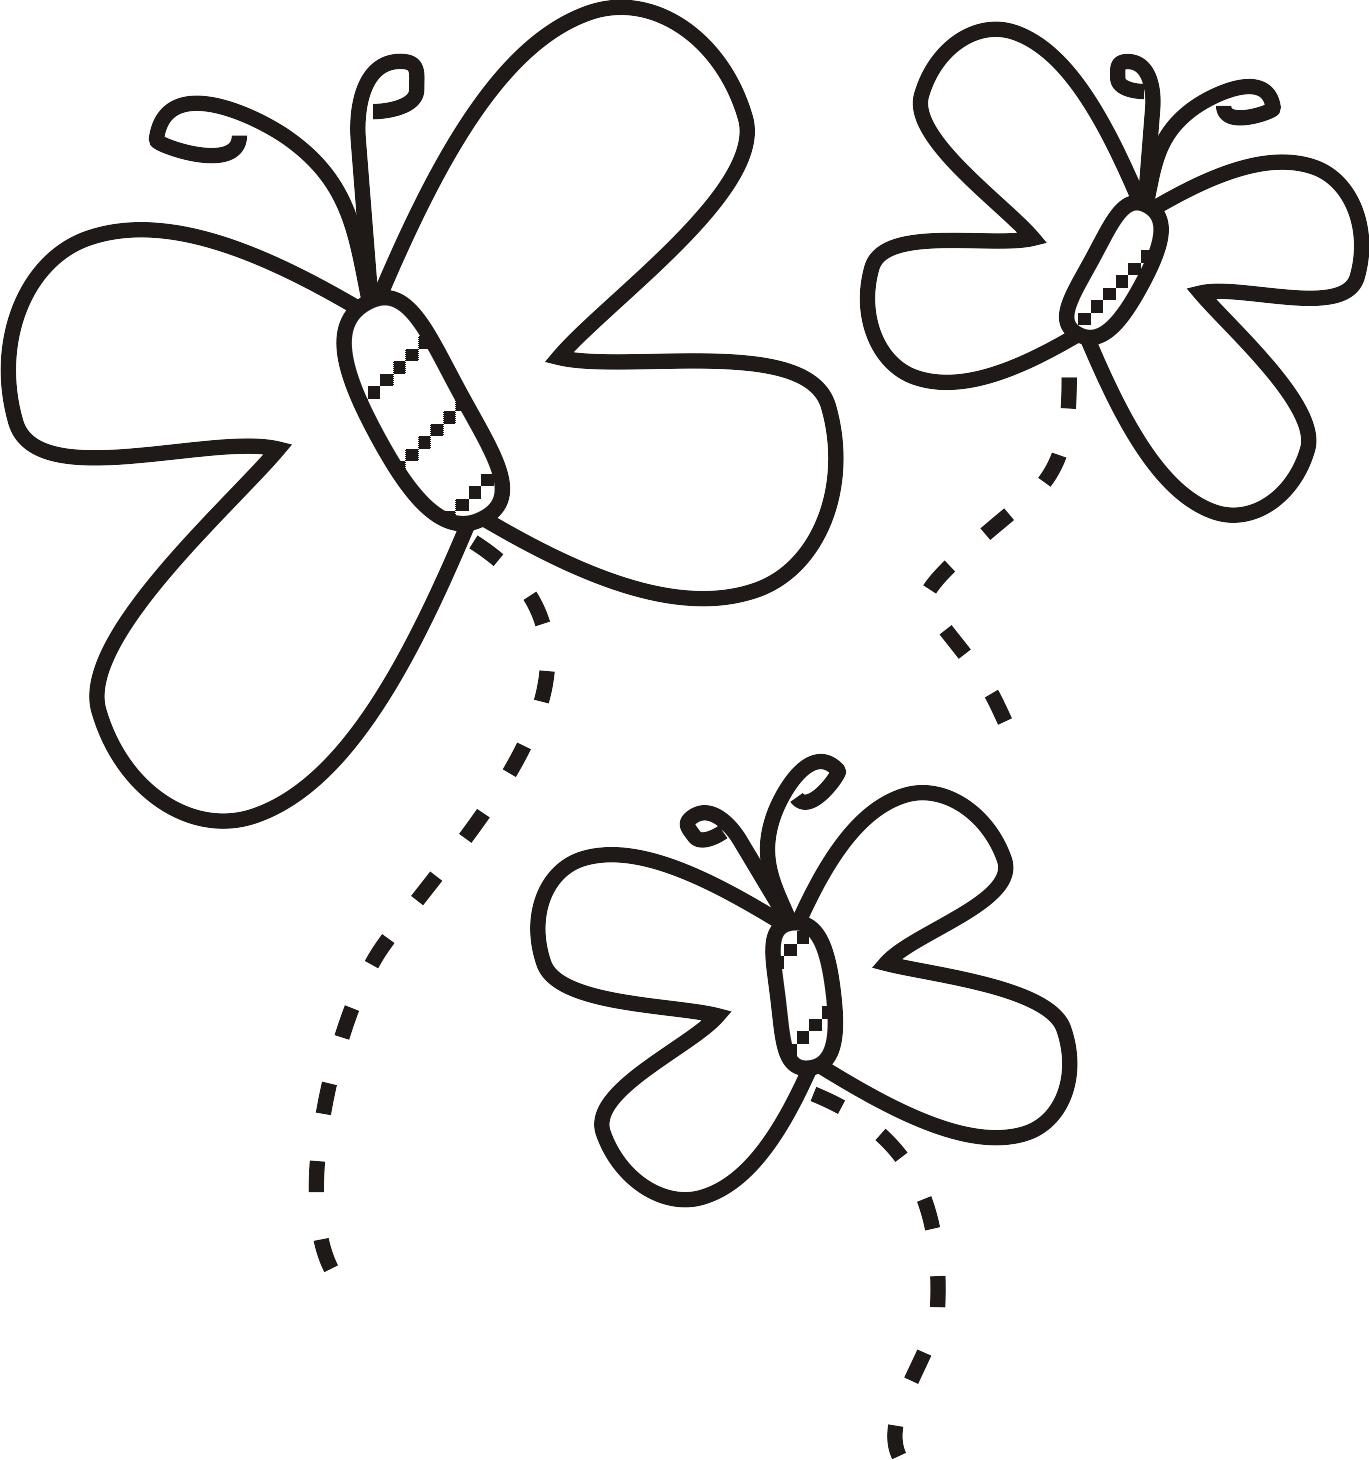 ese nhos de borboletas para imprimir colorir ou usar como moldes para